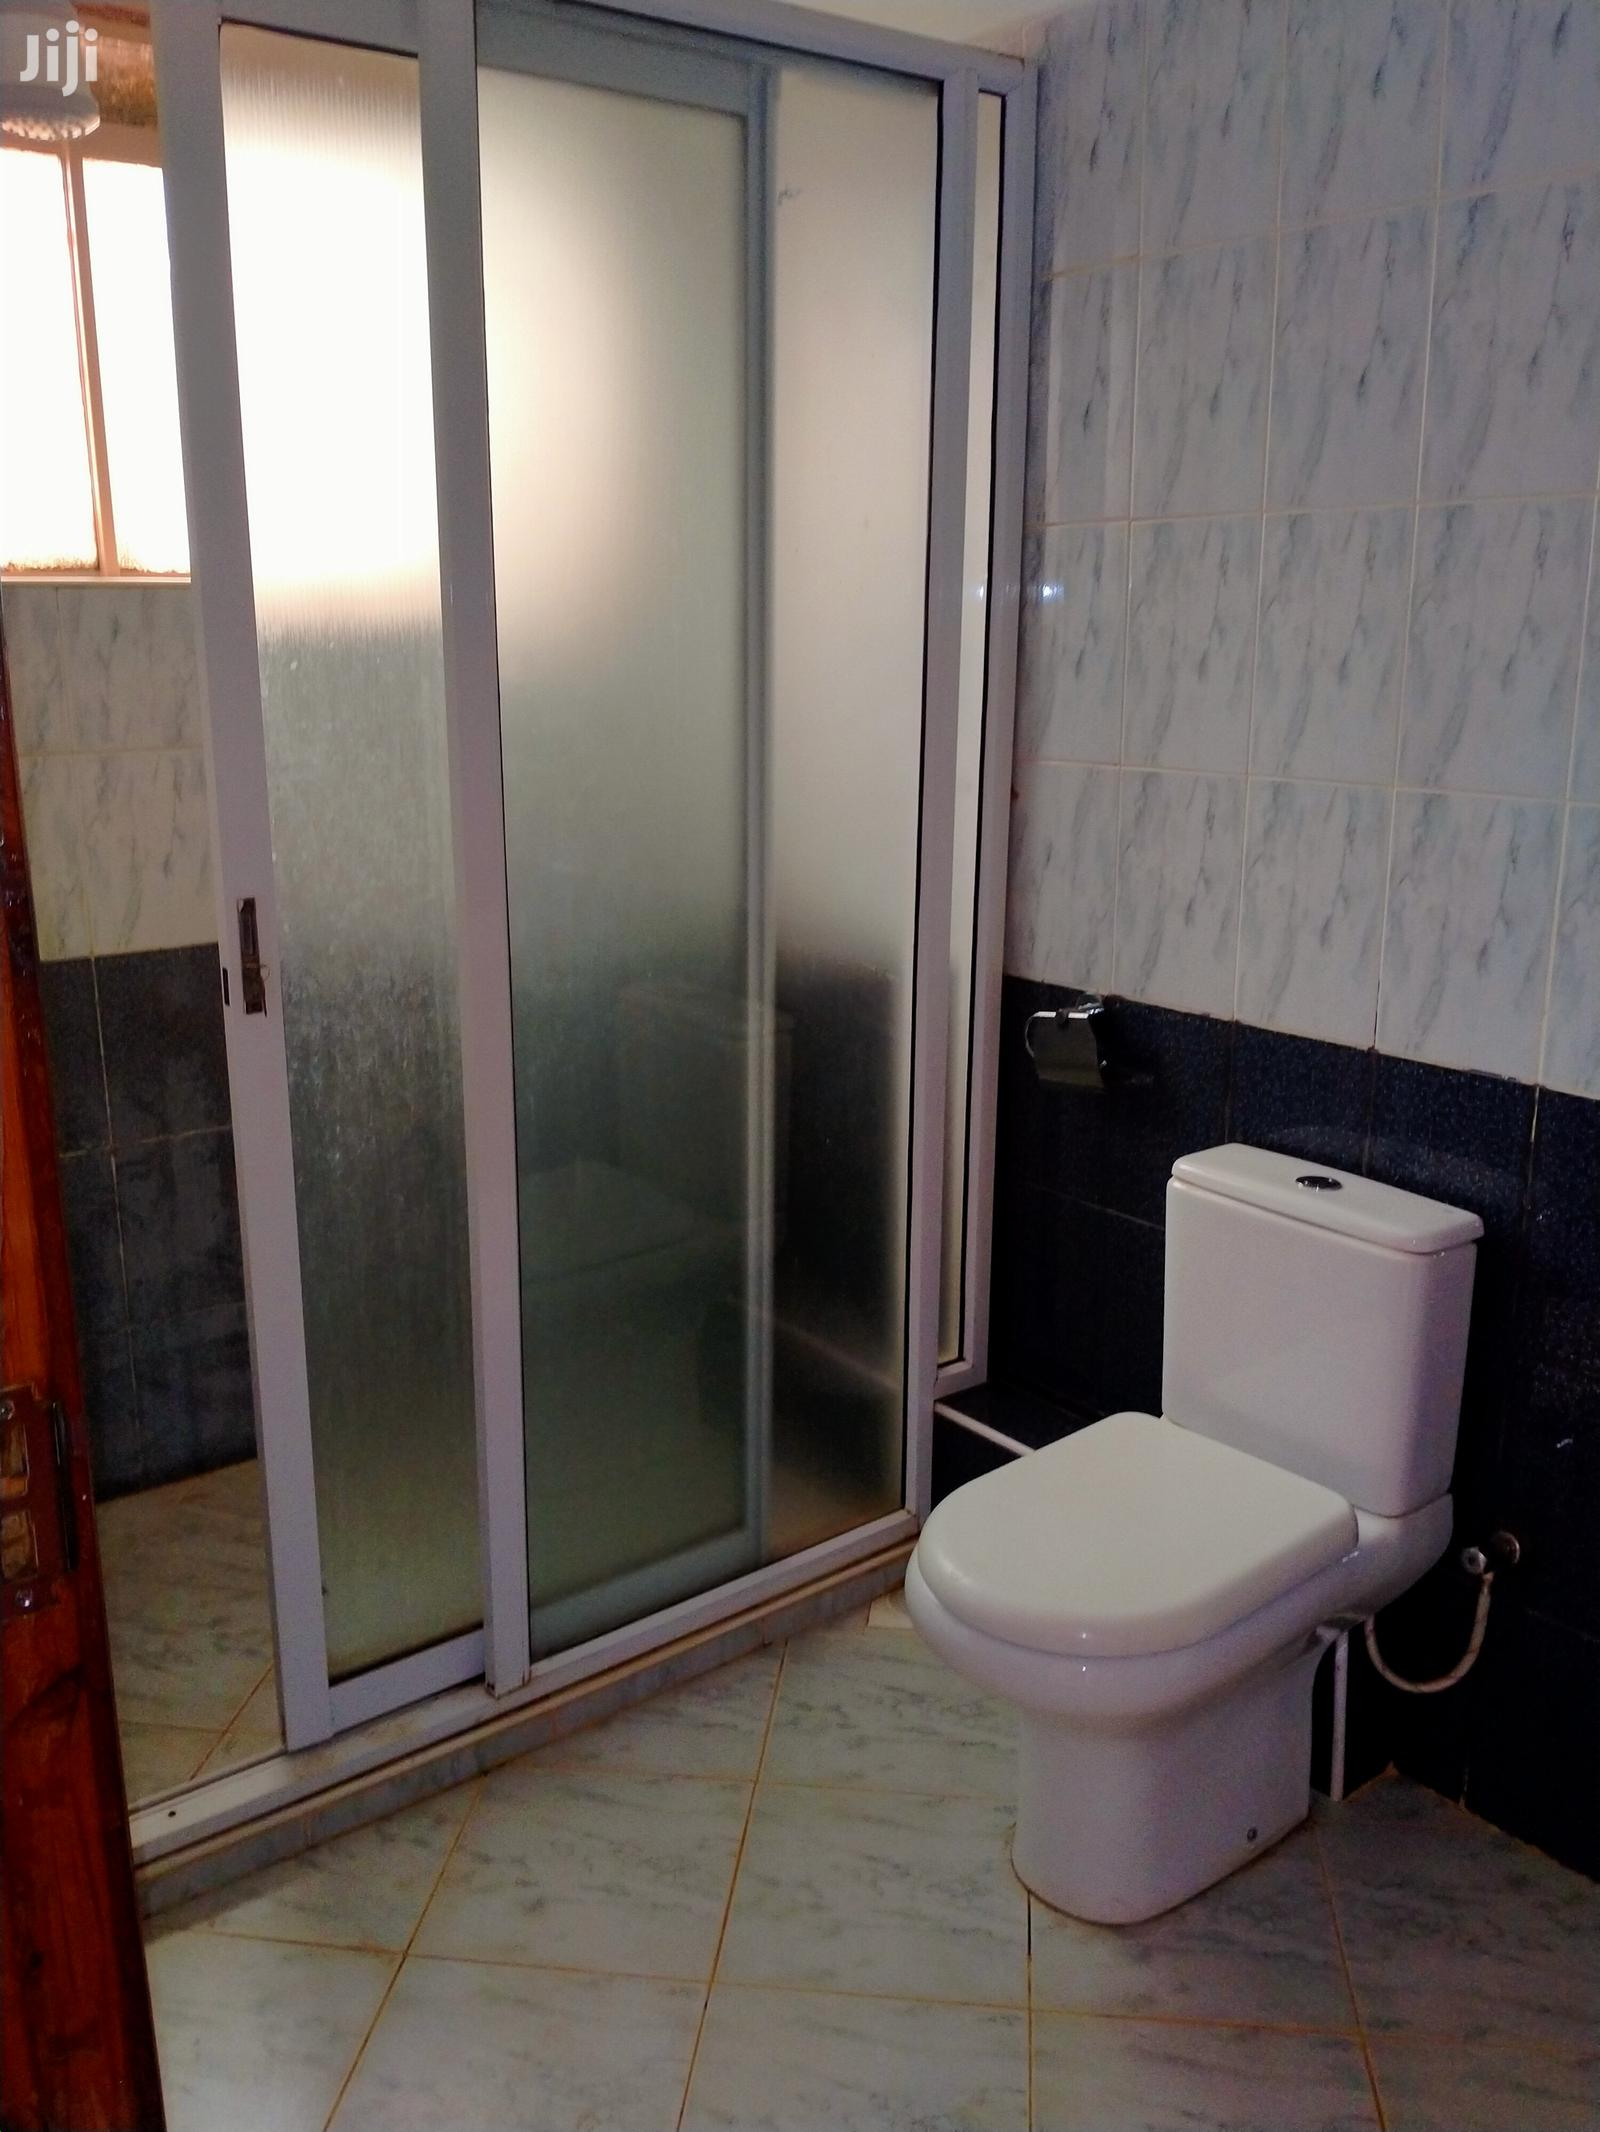 3 Bedroom 2 Bedroom en Suite | Houses & Apartments For Rent for sale in Thindigua/Kasarini, Kiambu, Kenya